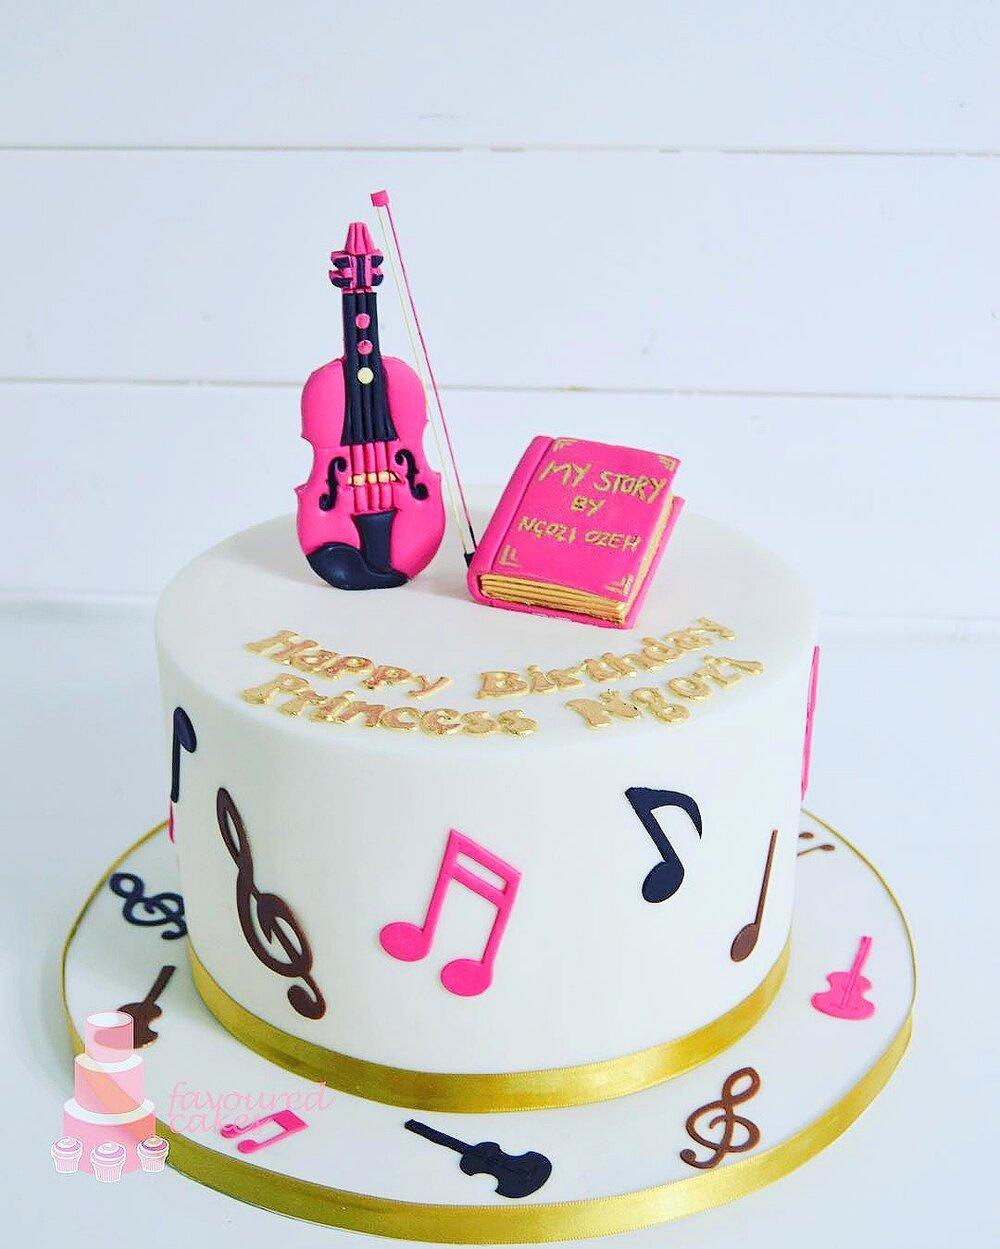 Customised Hobby Cake